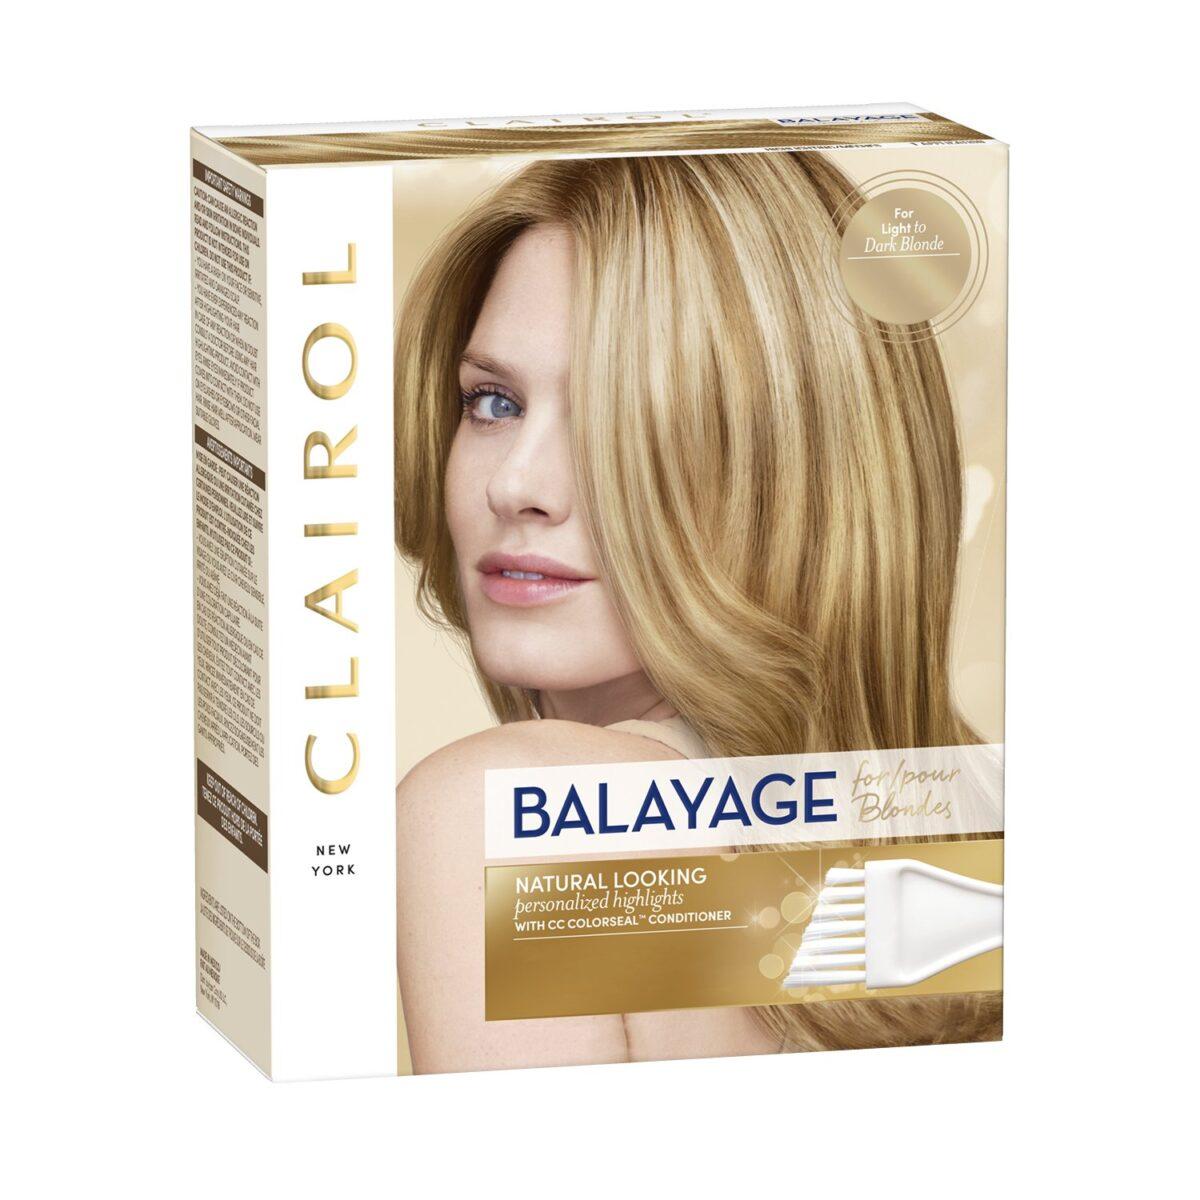 clairol balayage hair dye